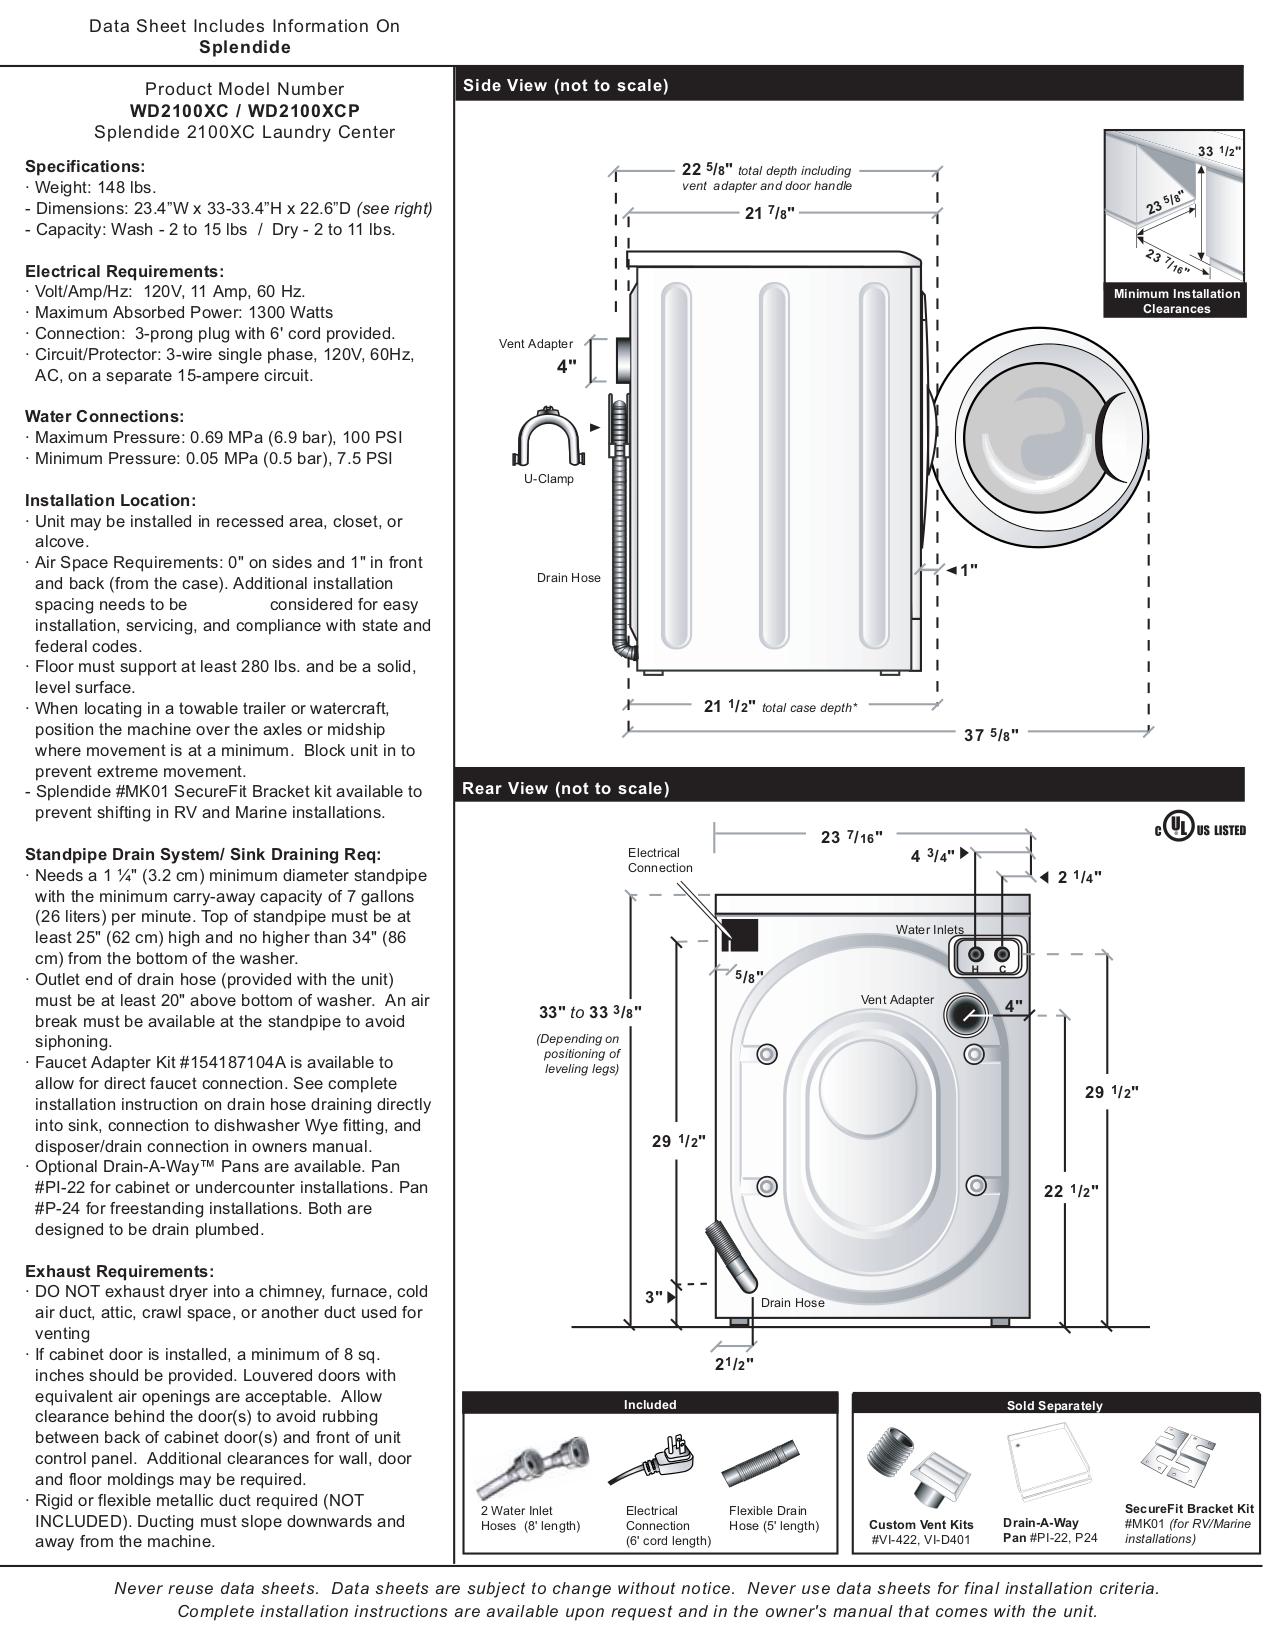 download free pdf for splendide 2100 washer dryers combo other manual rh umlib com splendide 2100 repair manual splendide 2100 owner's manual